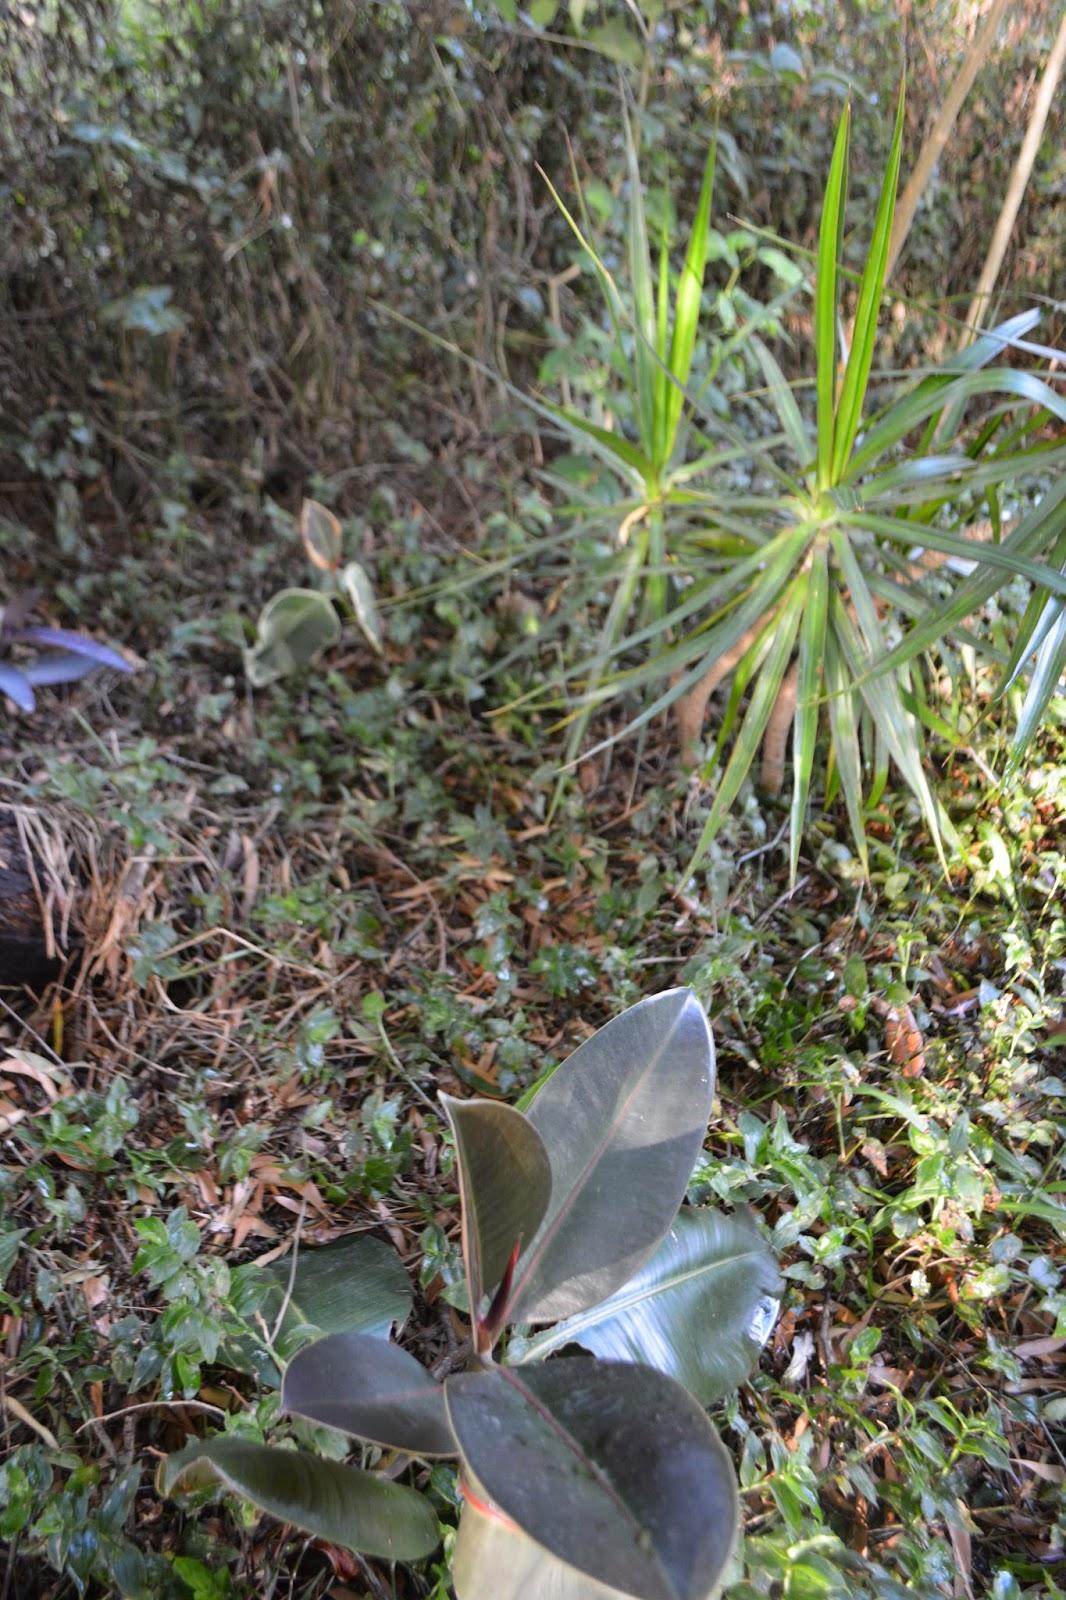 Ficus Elastica, hoja negra y hoja variegada